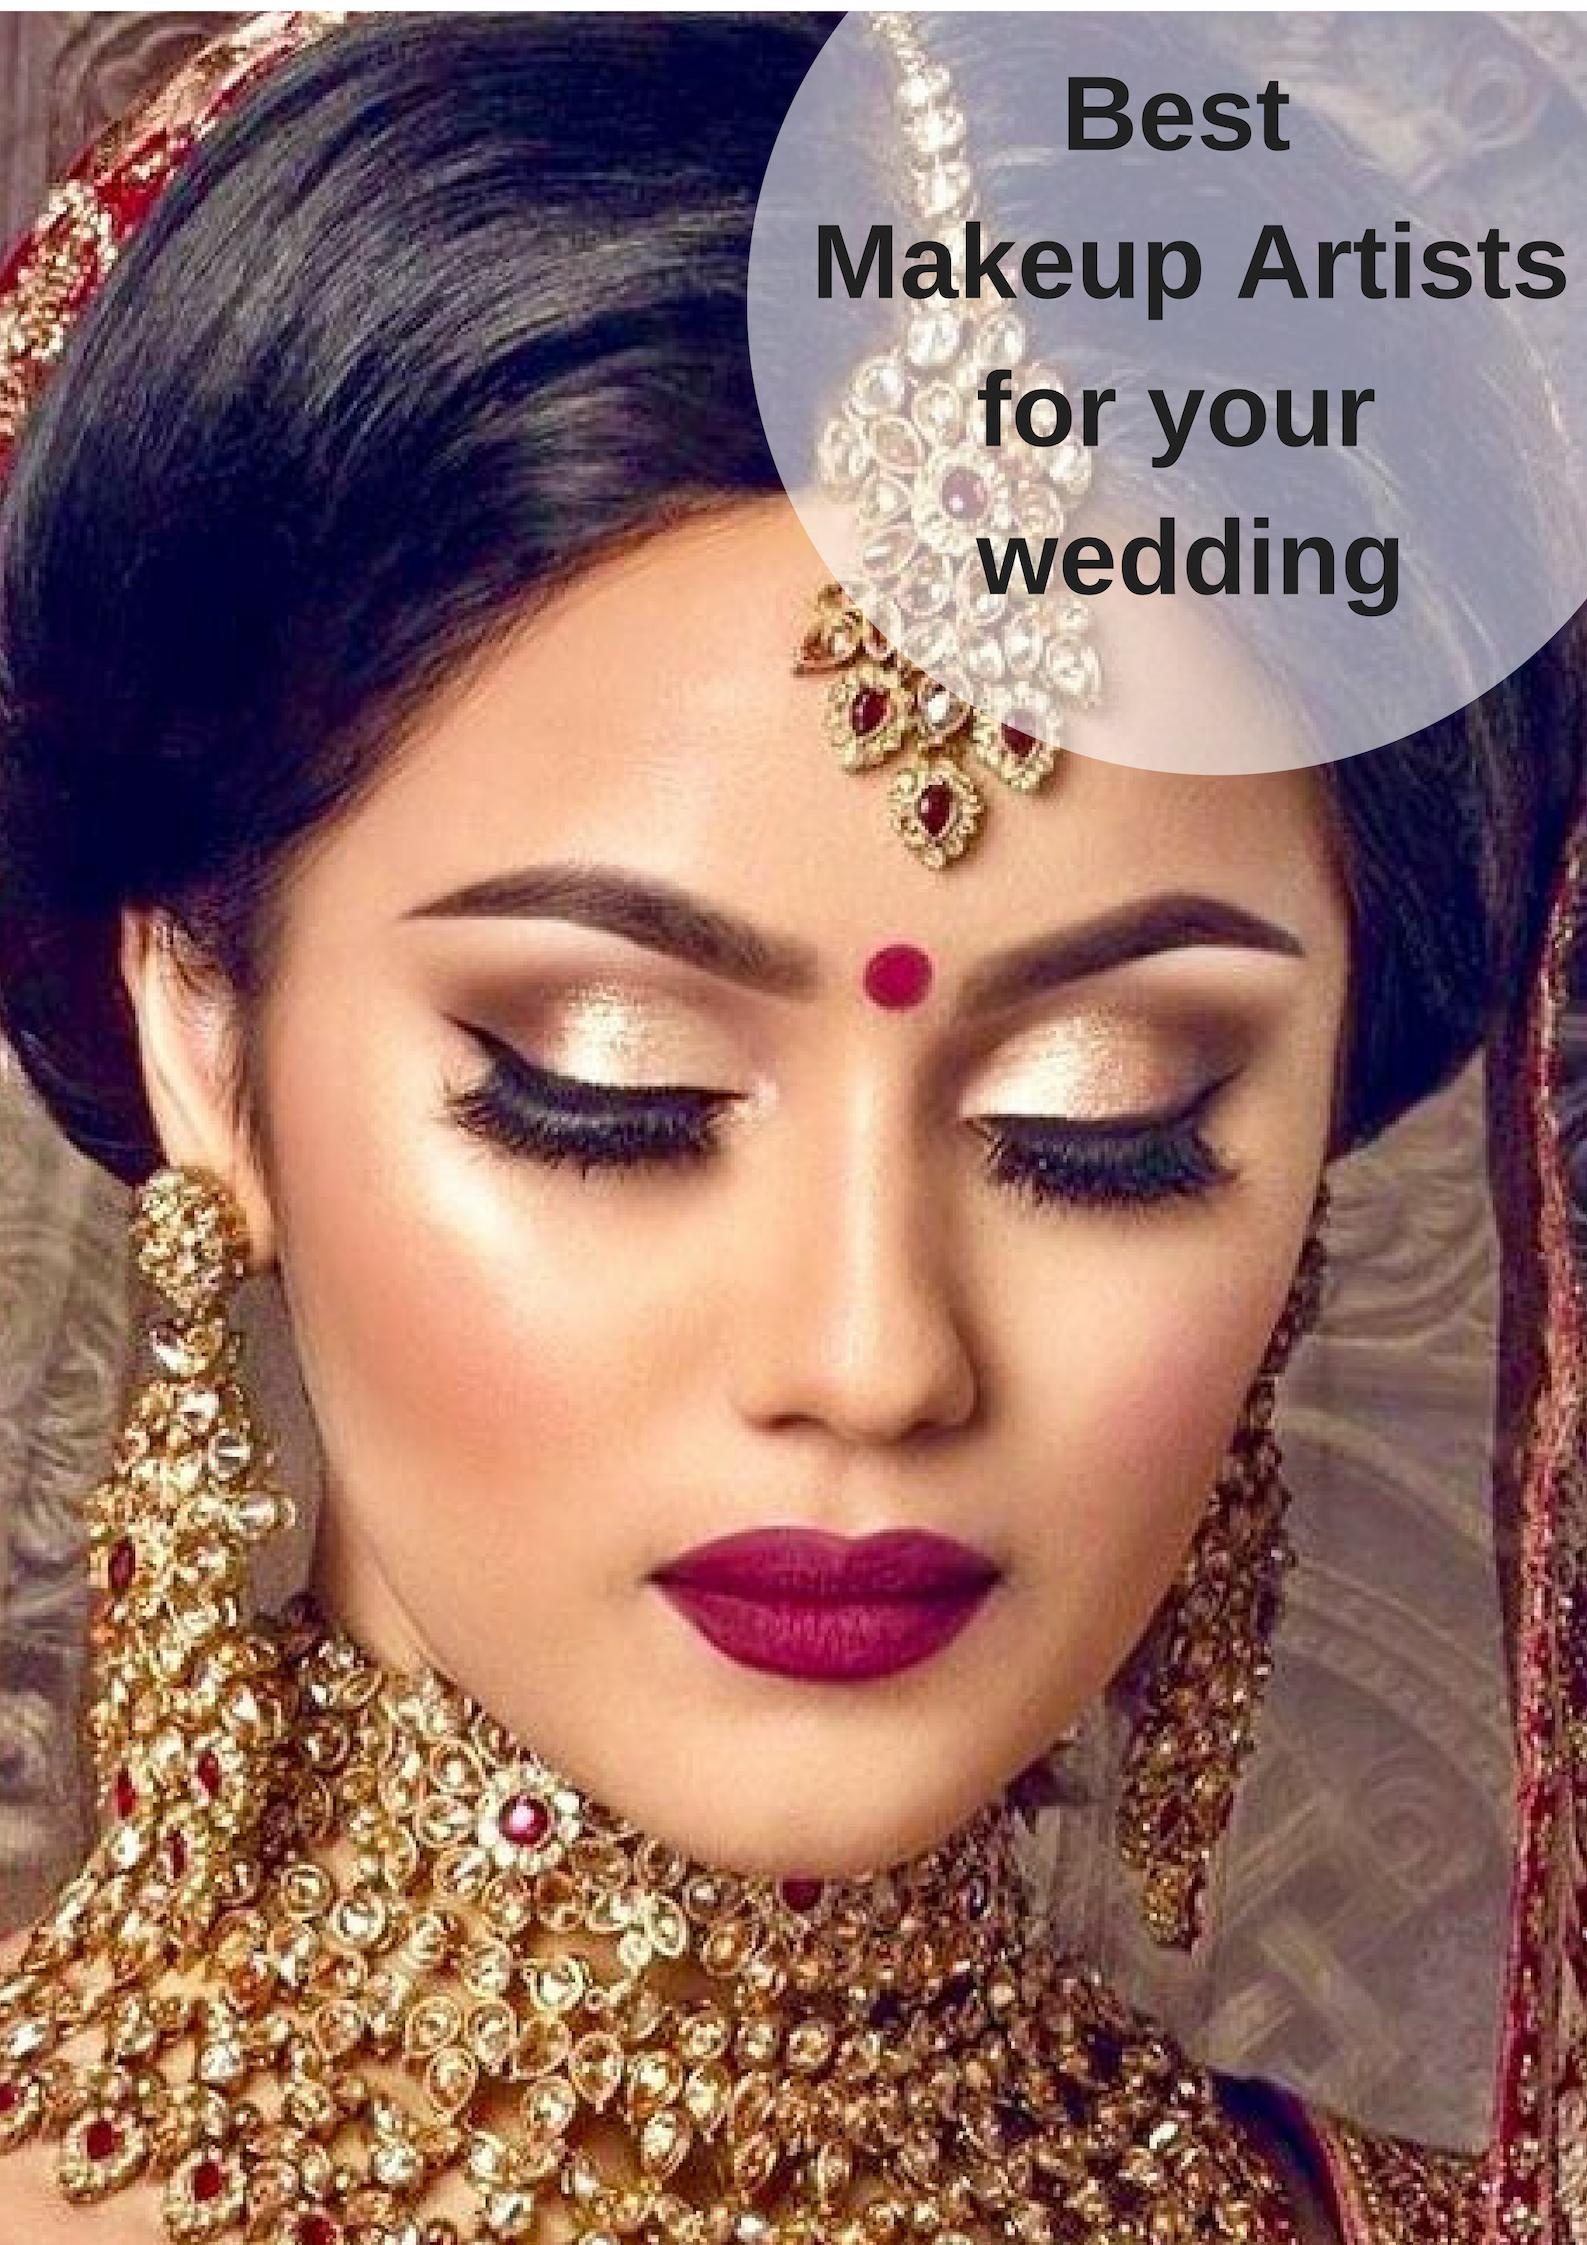 choice of best makeup artist for weddings | bridal makeup